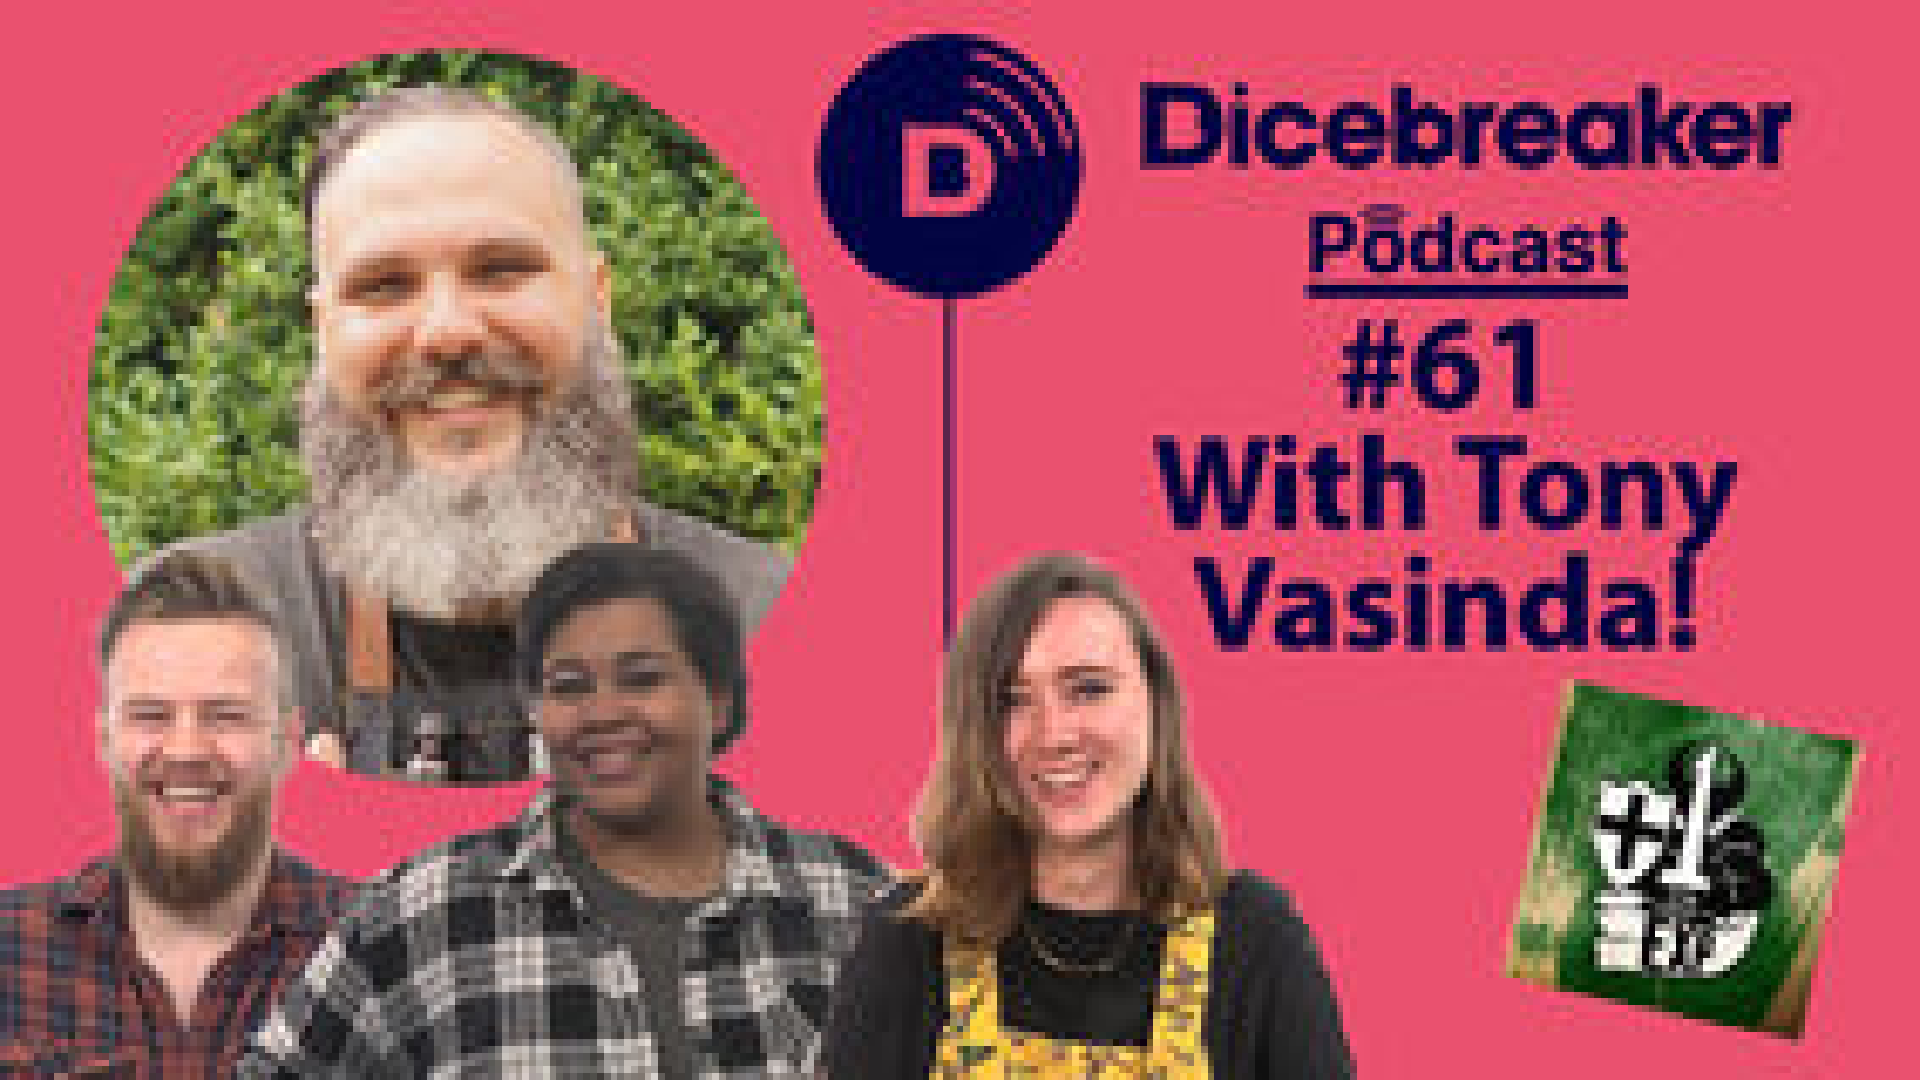 Dicebreaker Podcast Episode 61